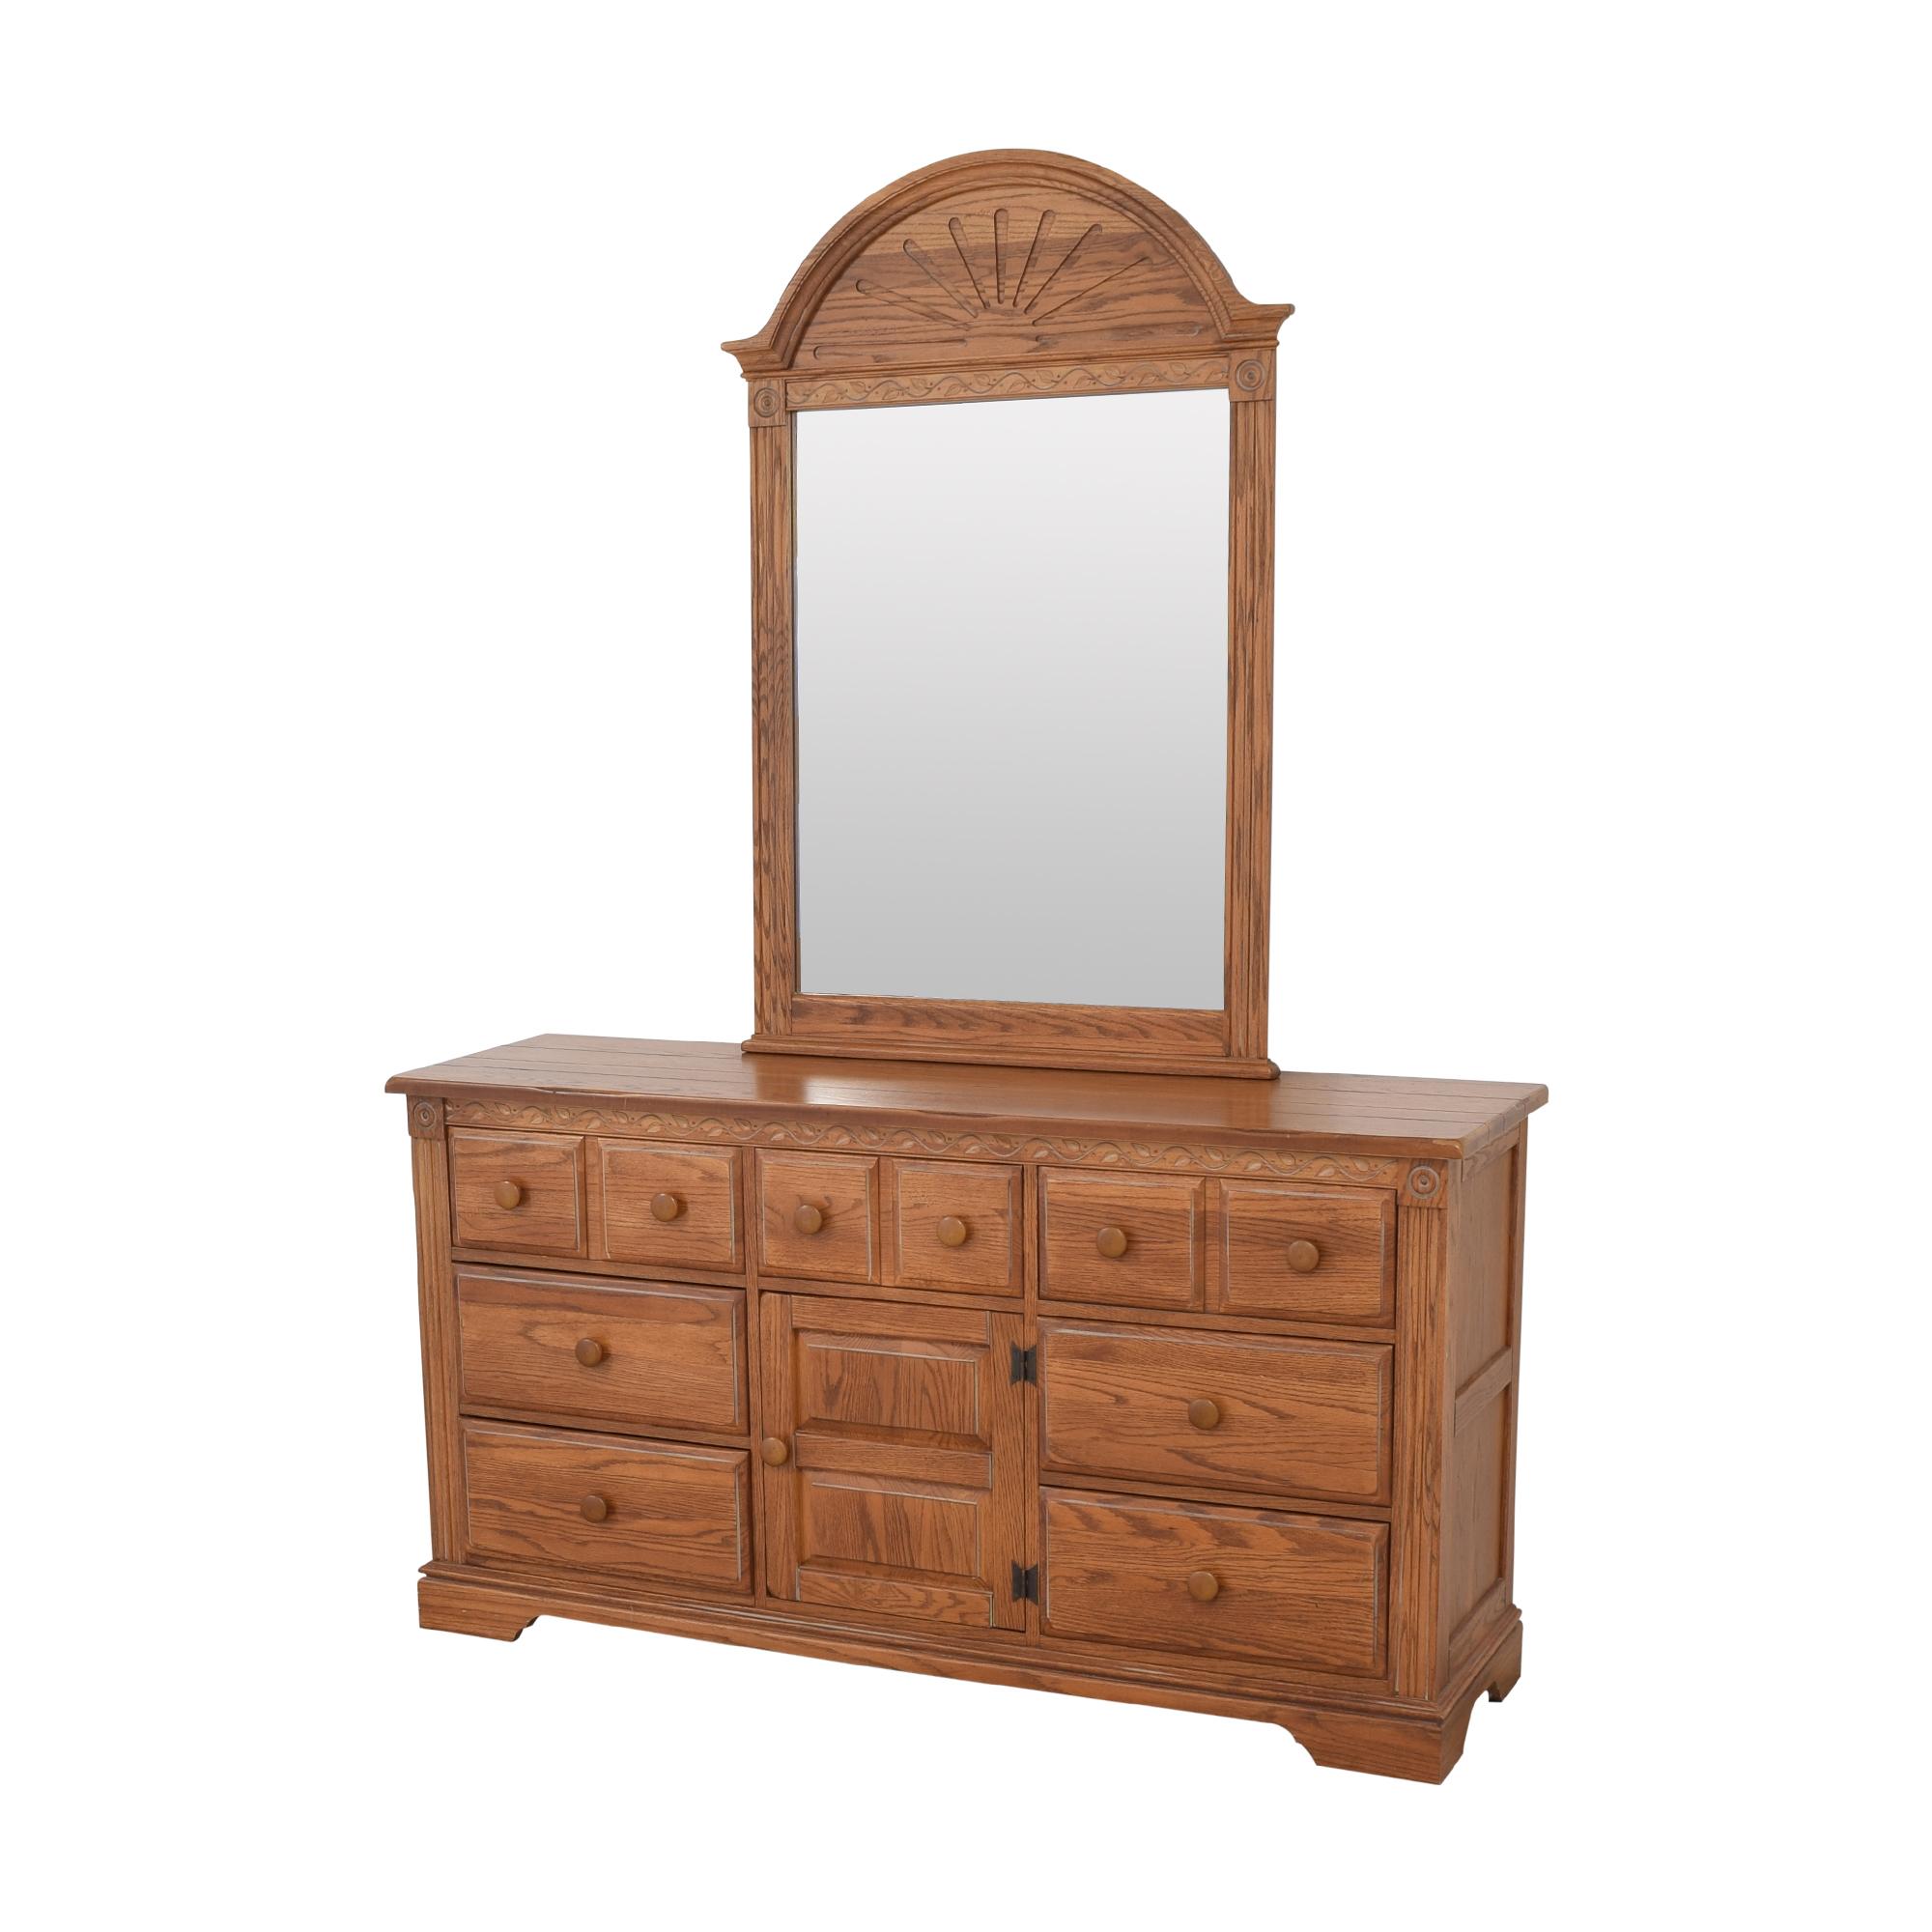 buy Broyhill Door Dresser with Mirror Broyhill Furniture Storage